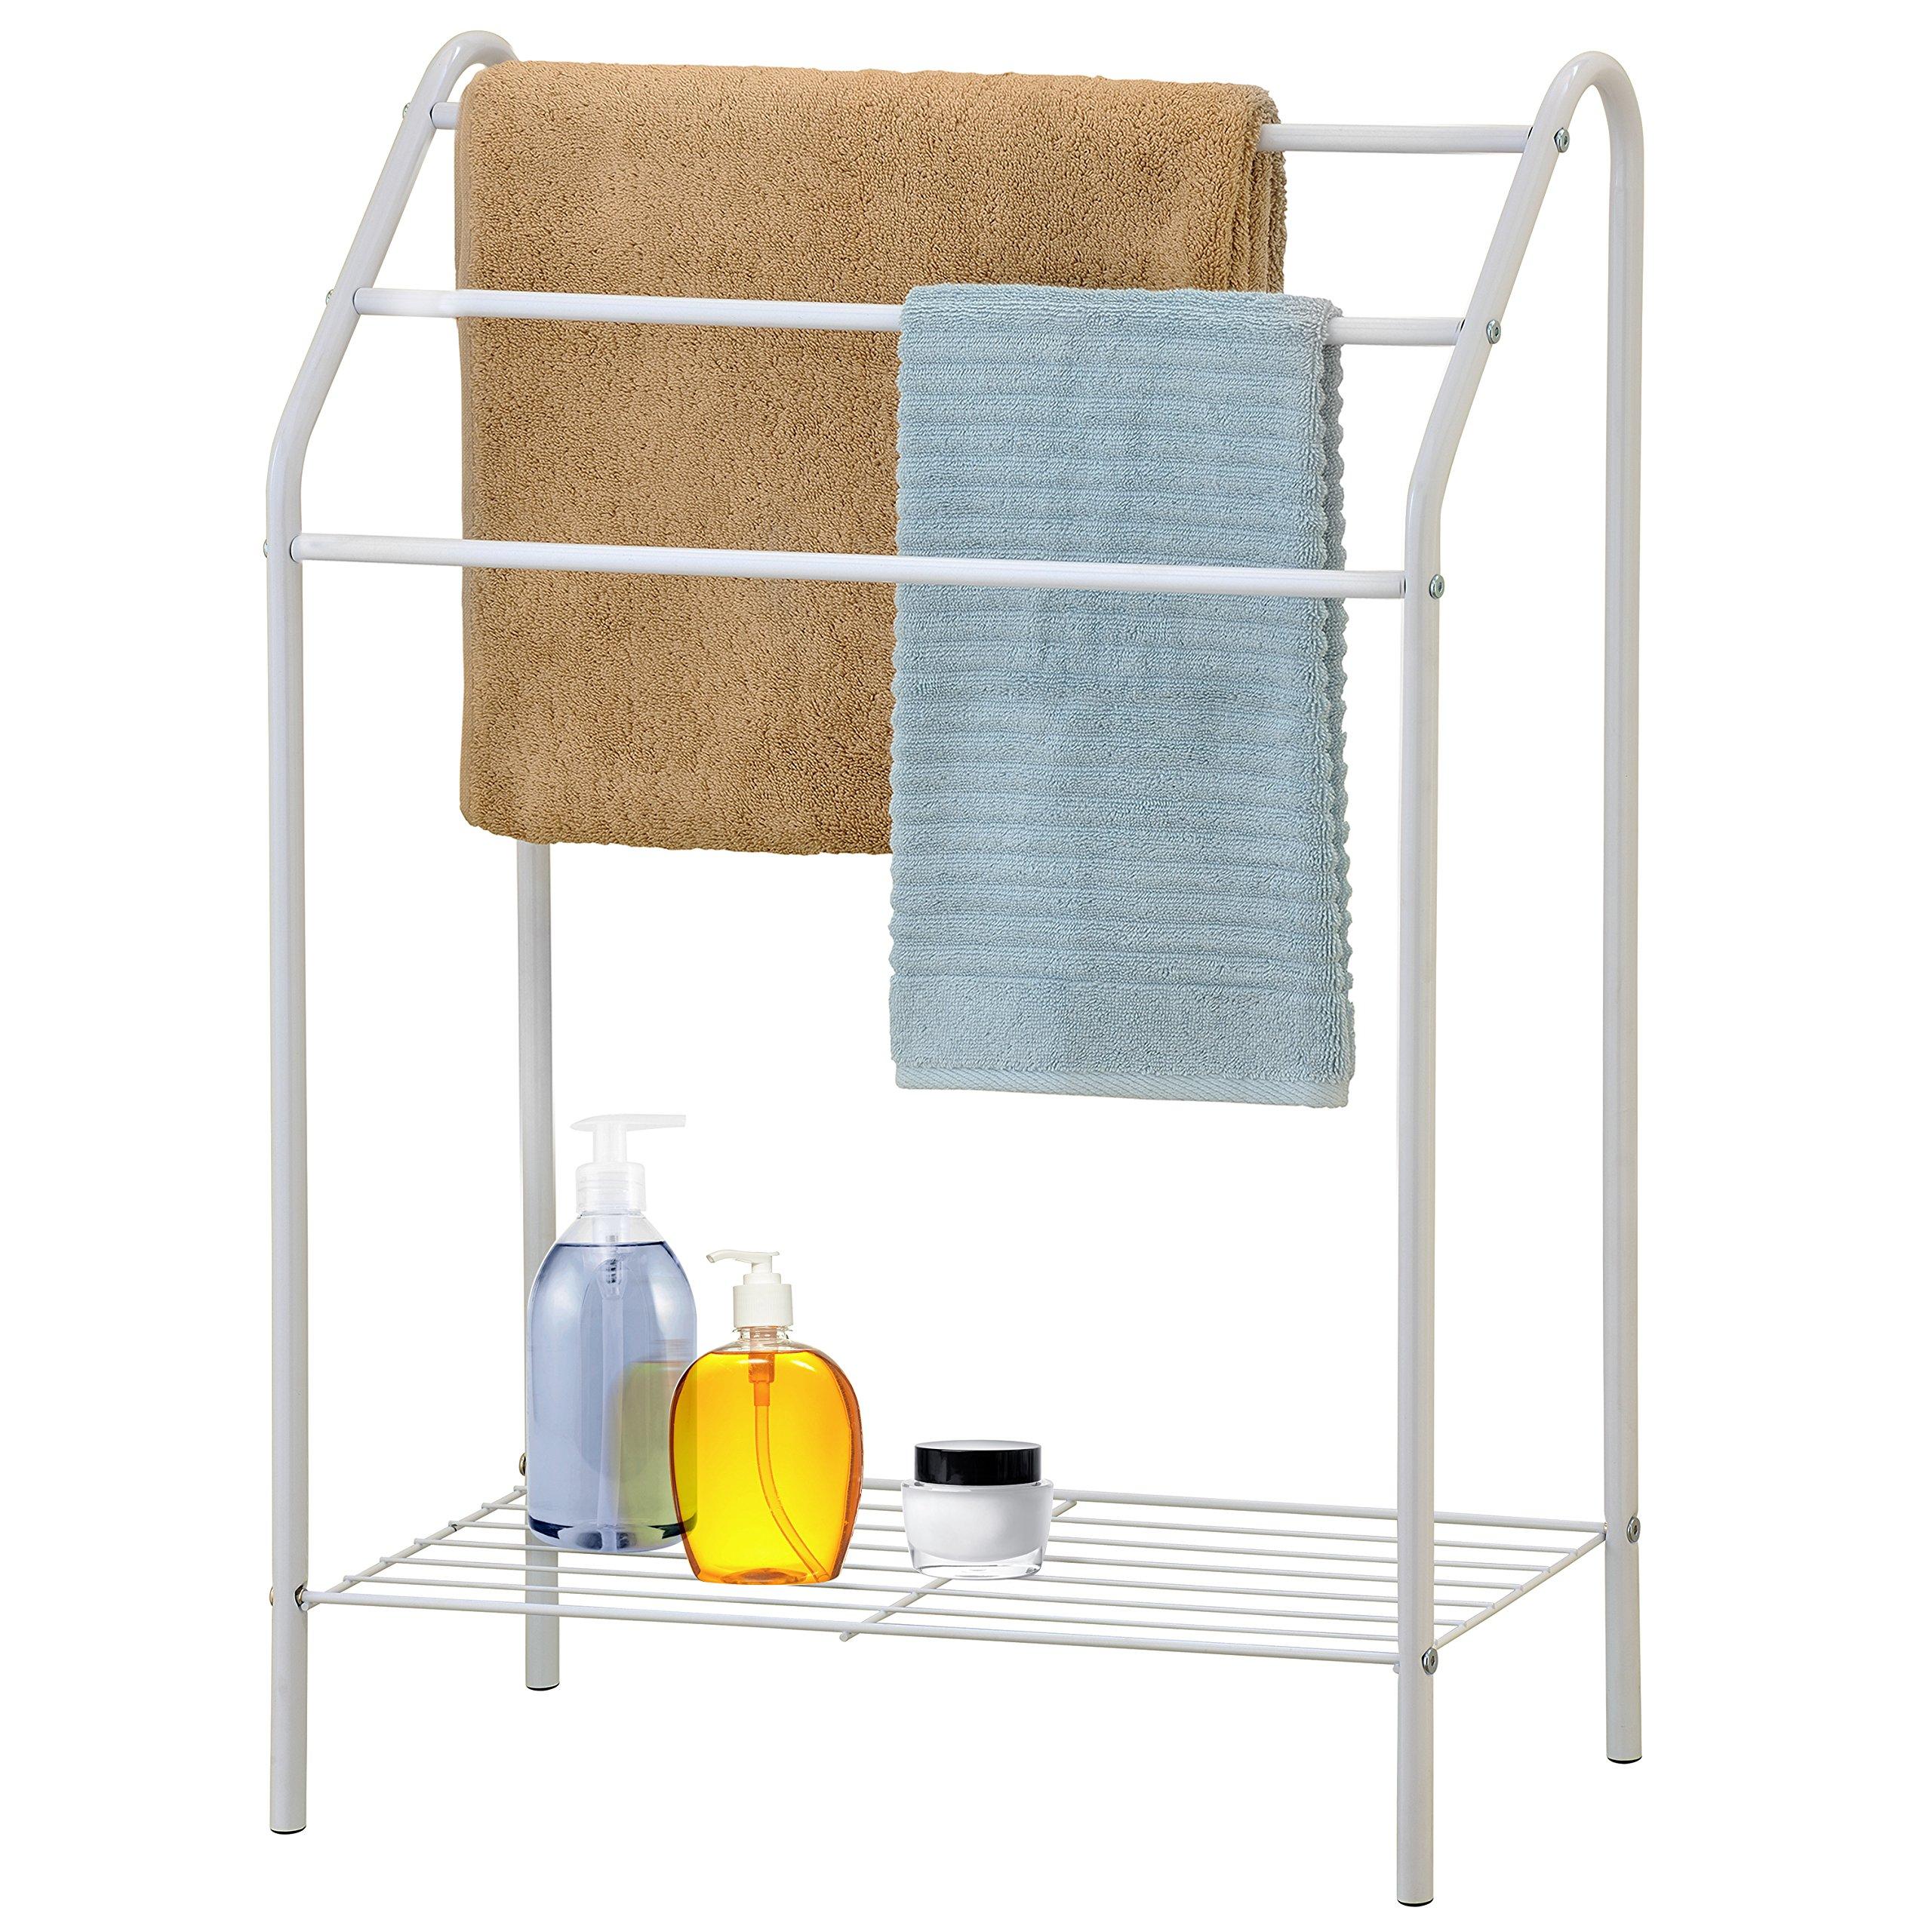 Freestanding 3 Tier Metal Towel Rack, Chrome Bathroom Towel Bar, White